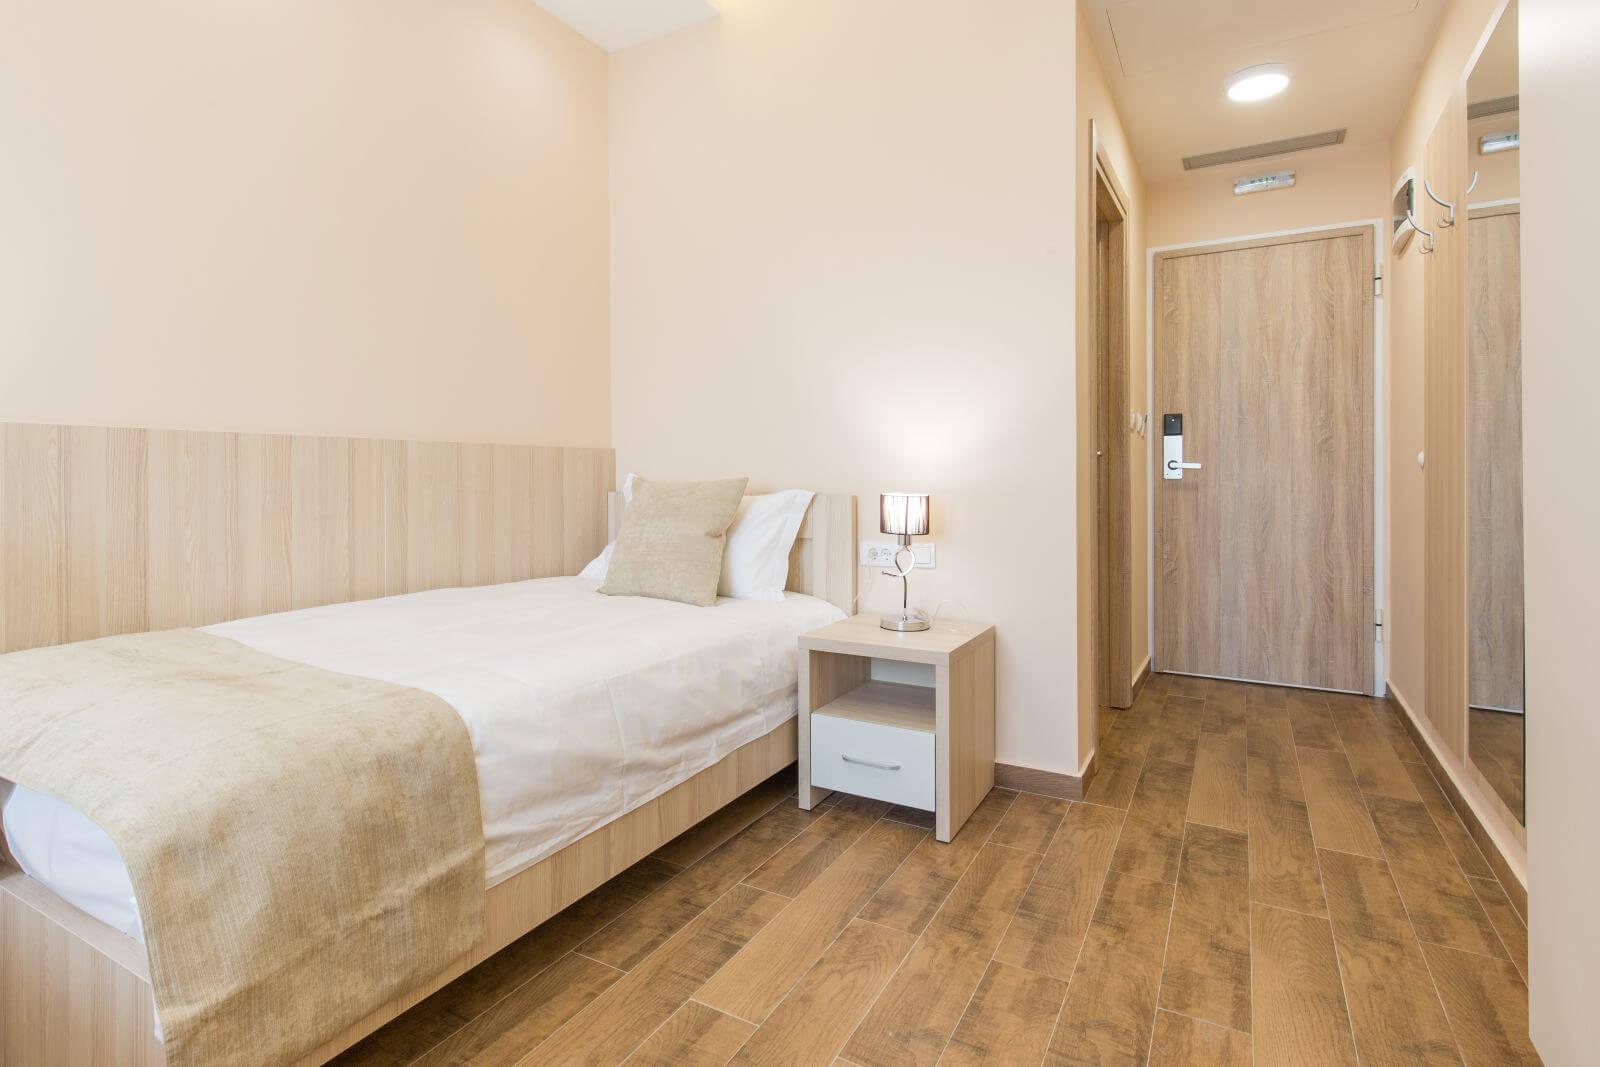 Hotel room interior, bedroom